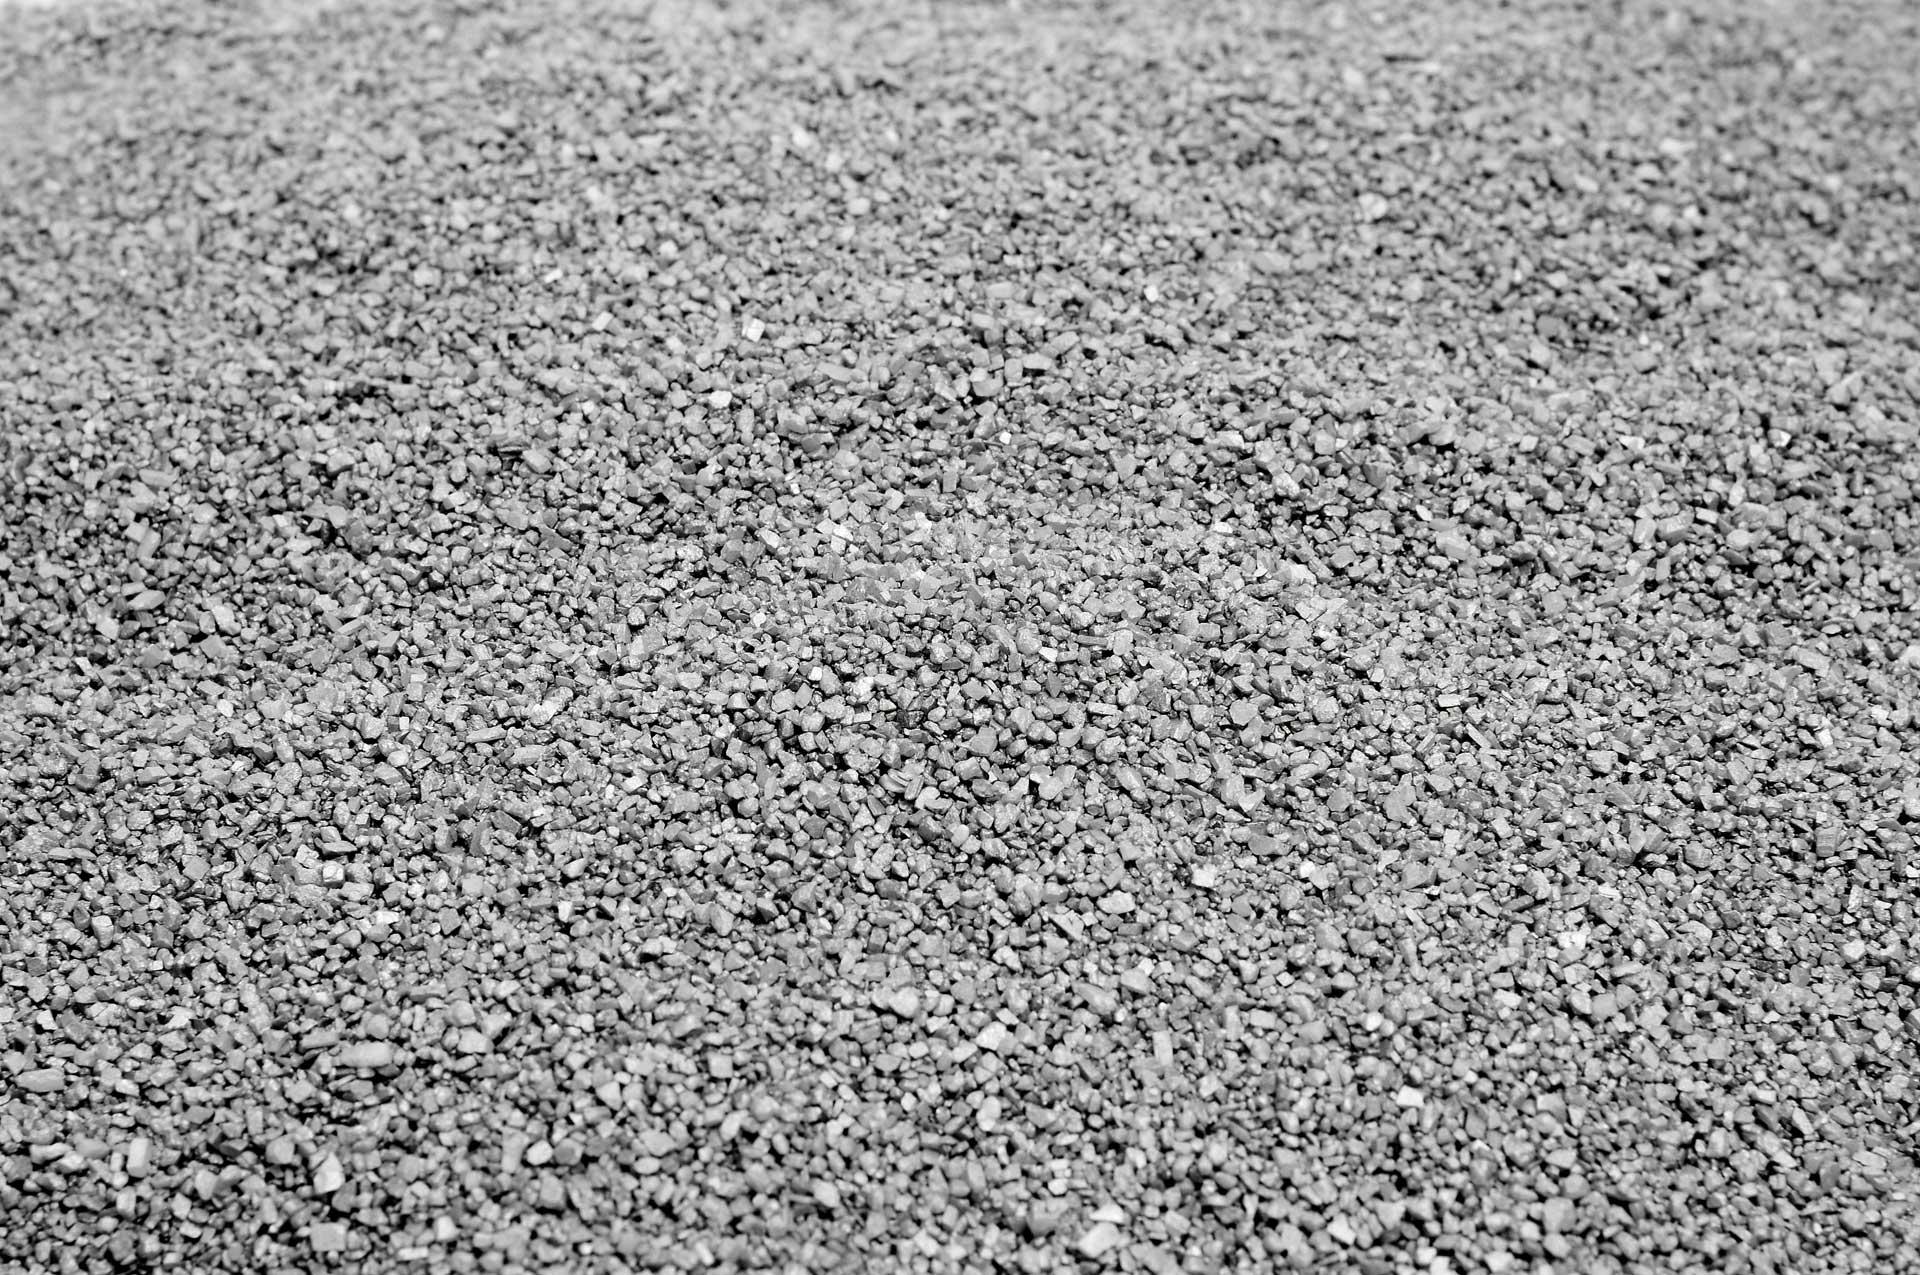 #57 Bluestone Applications - image of a bulk pile of bluestone